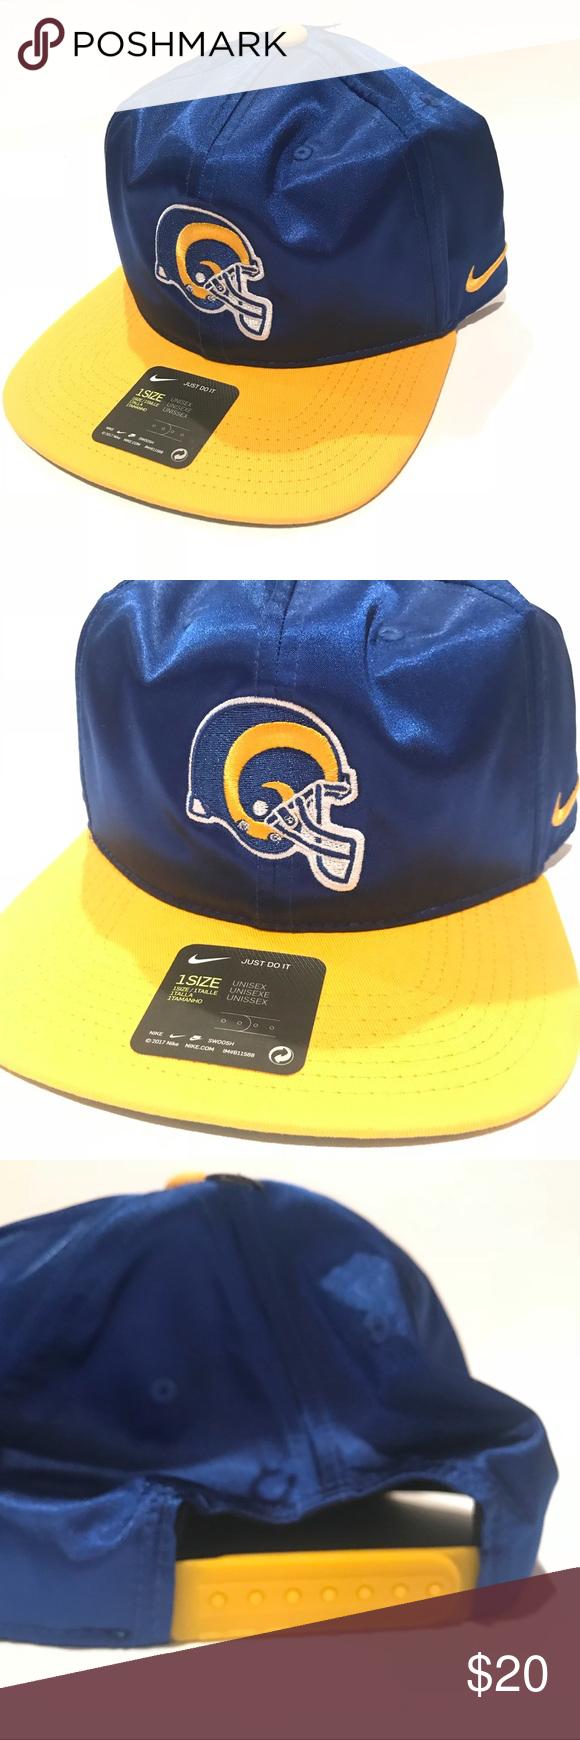 7c1edff3b New Nike Los Angeles Rams Snapback One Size Item is brand new ...